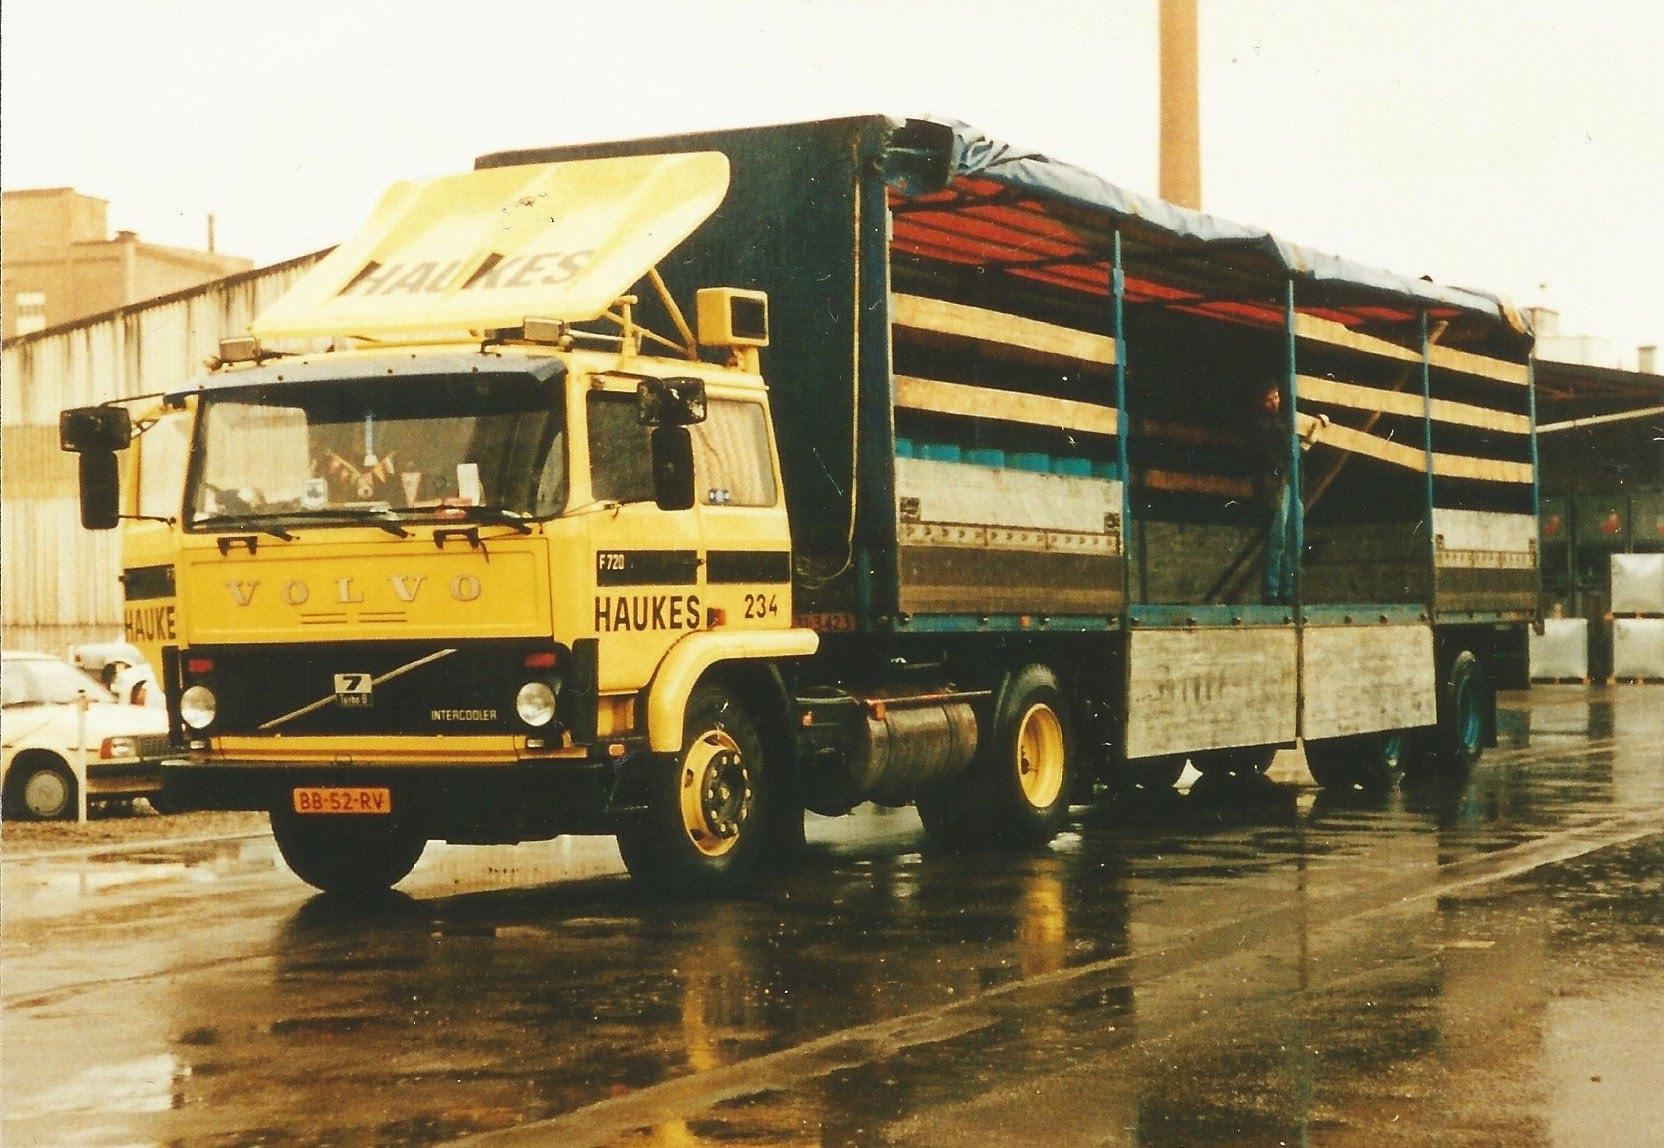 Hans-Megens-1985-Volvo-F7-220-PK-1